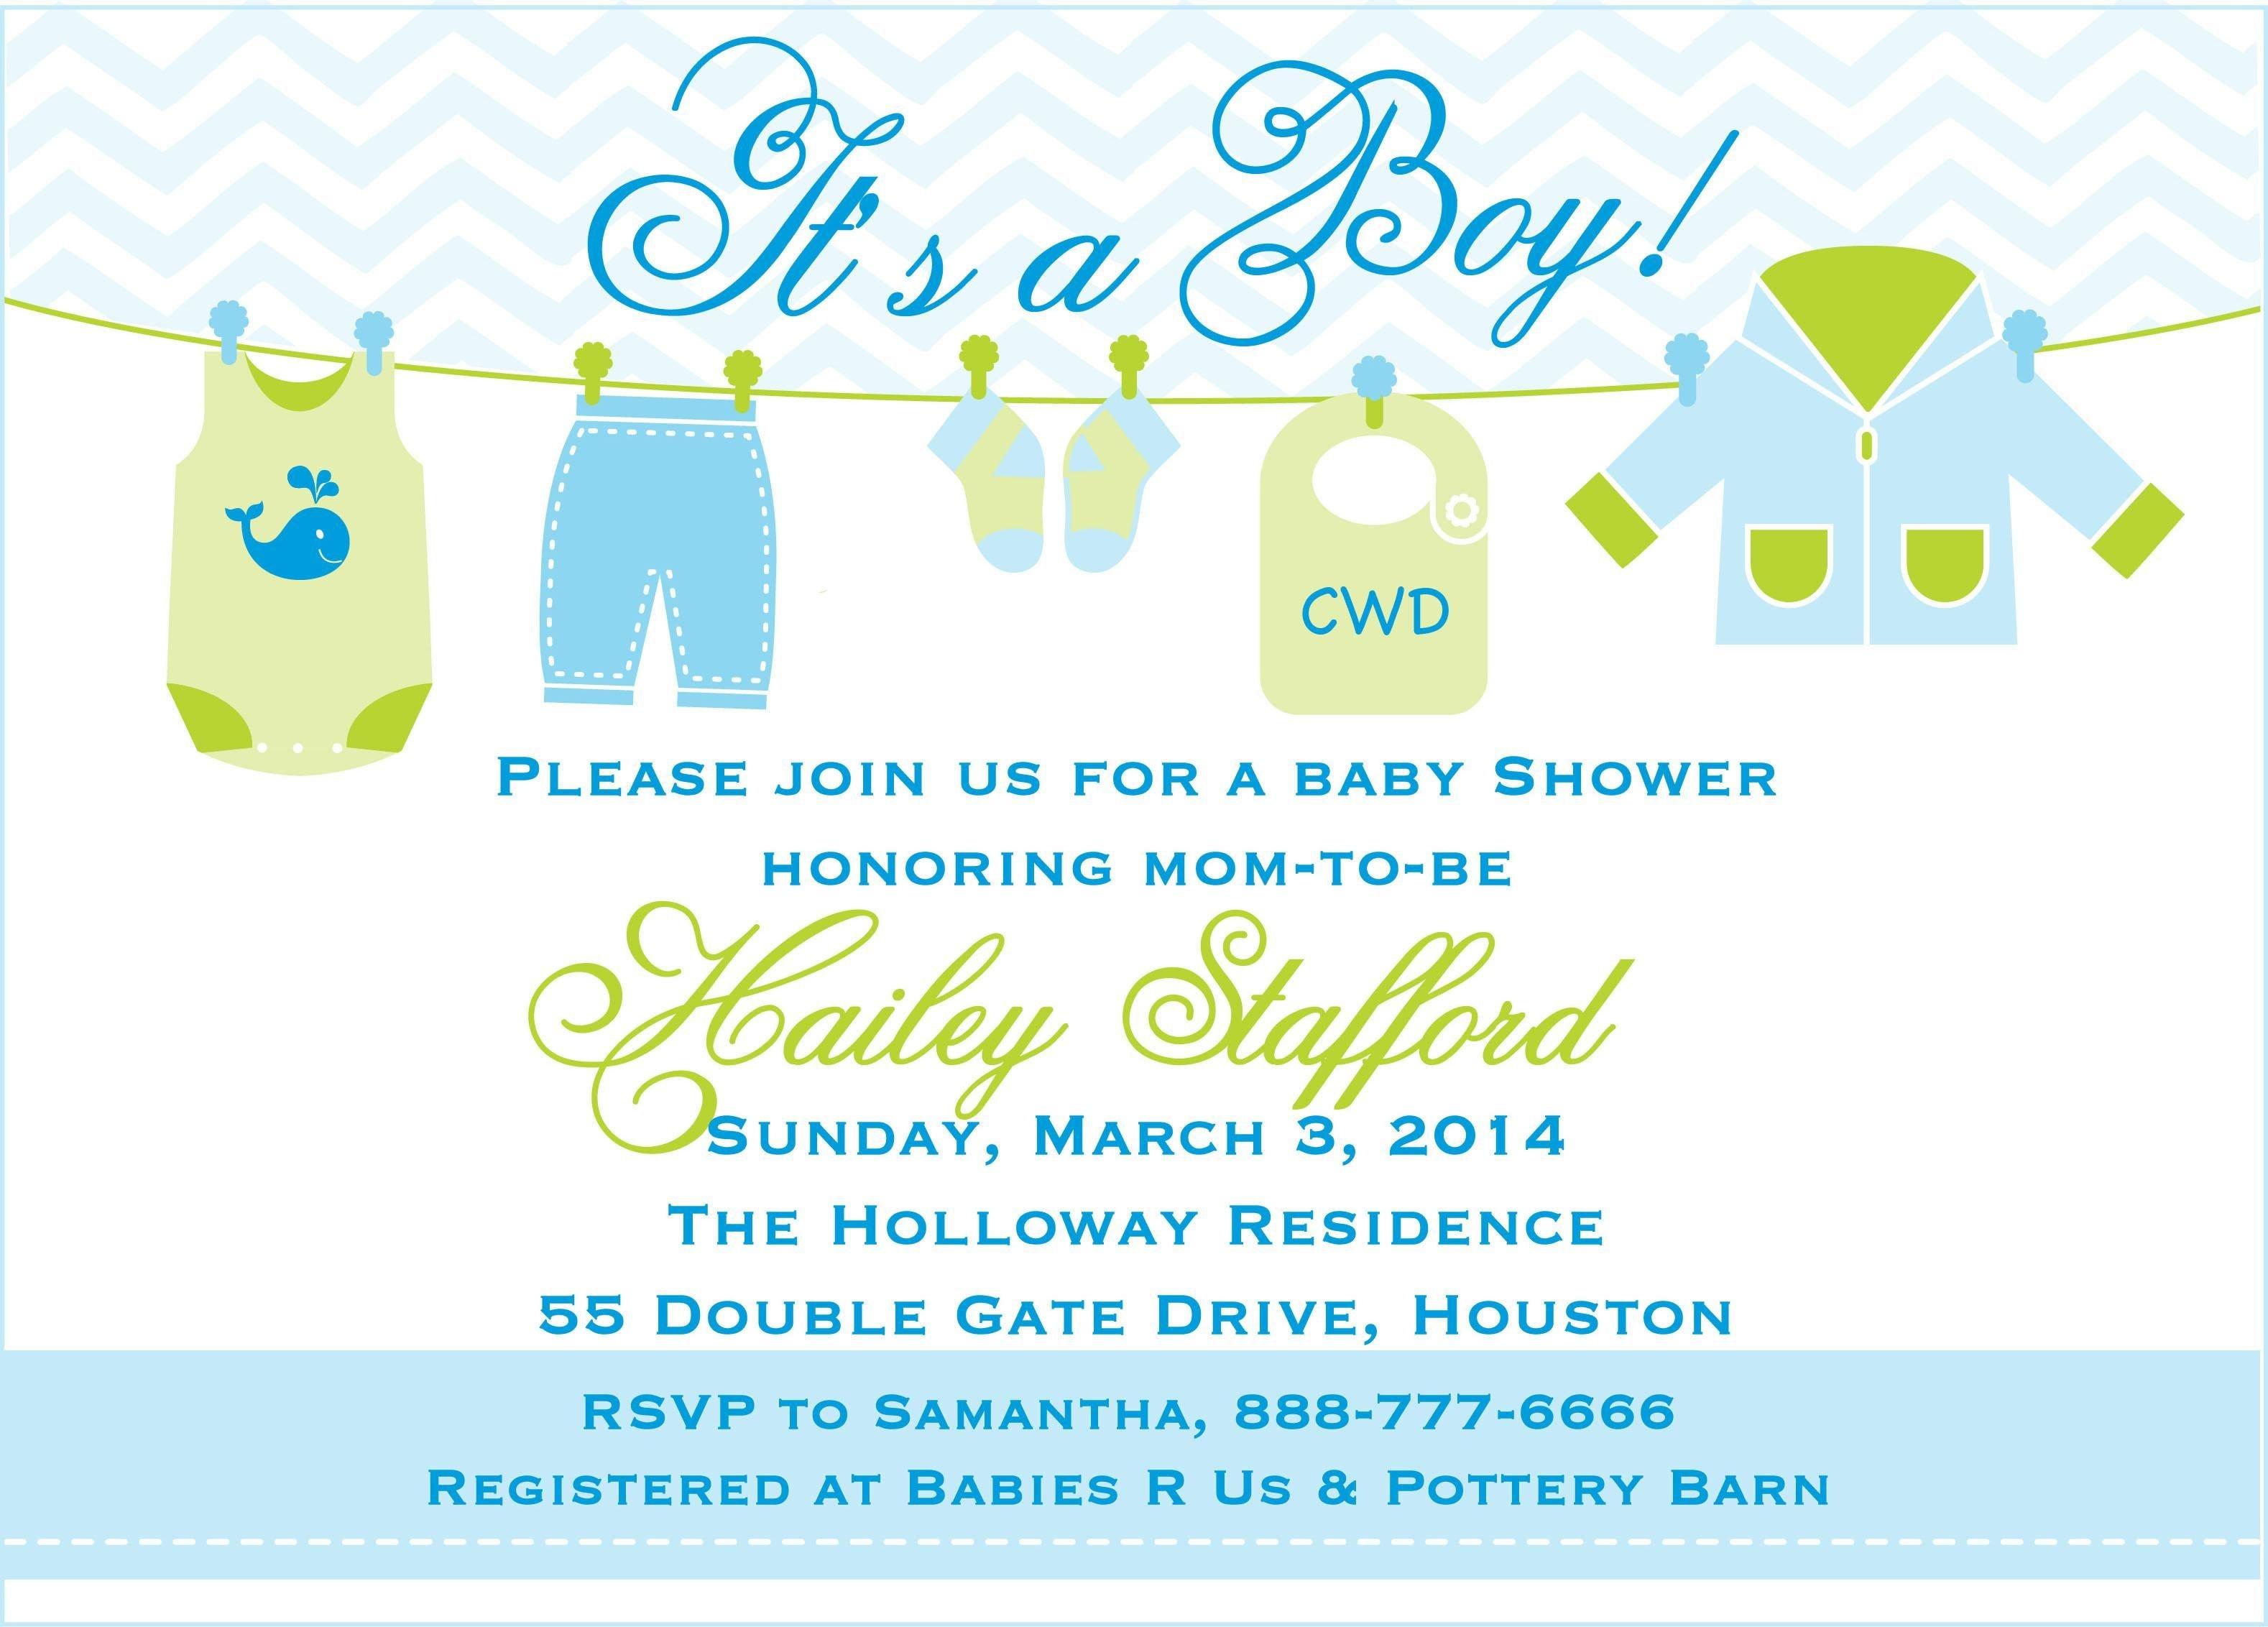 Baby Boy Shower Invitations Templates Free | Baby Shower In 2019 - Free Baby Shower Invitation Maker Online Printable